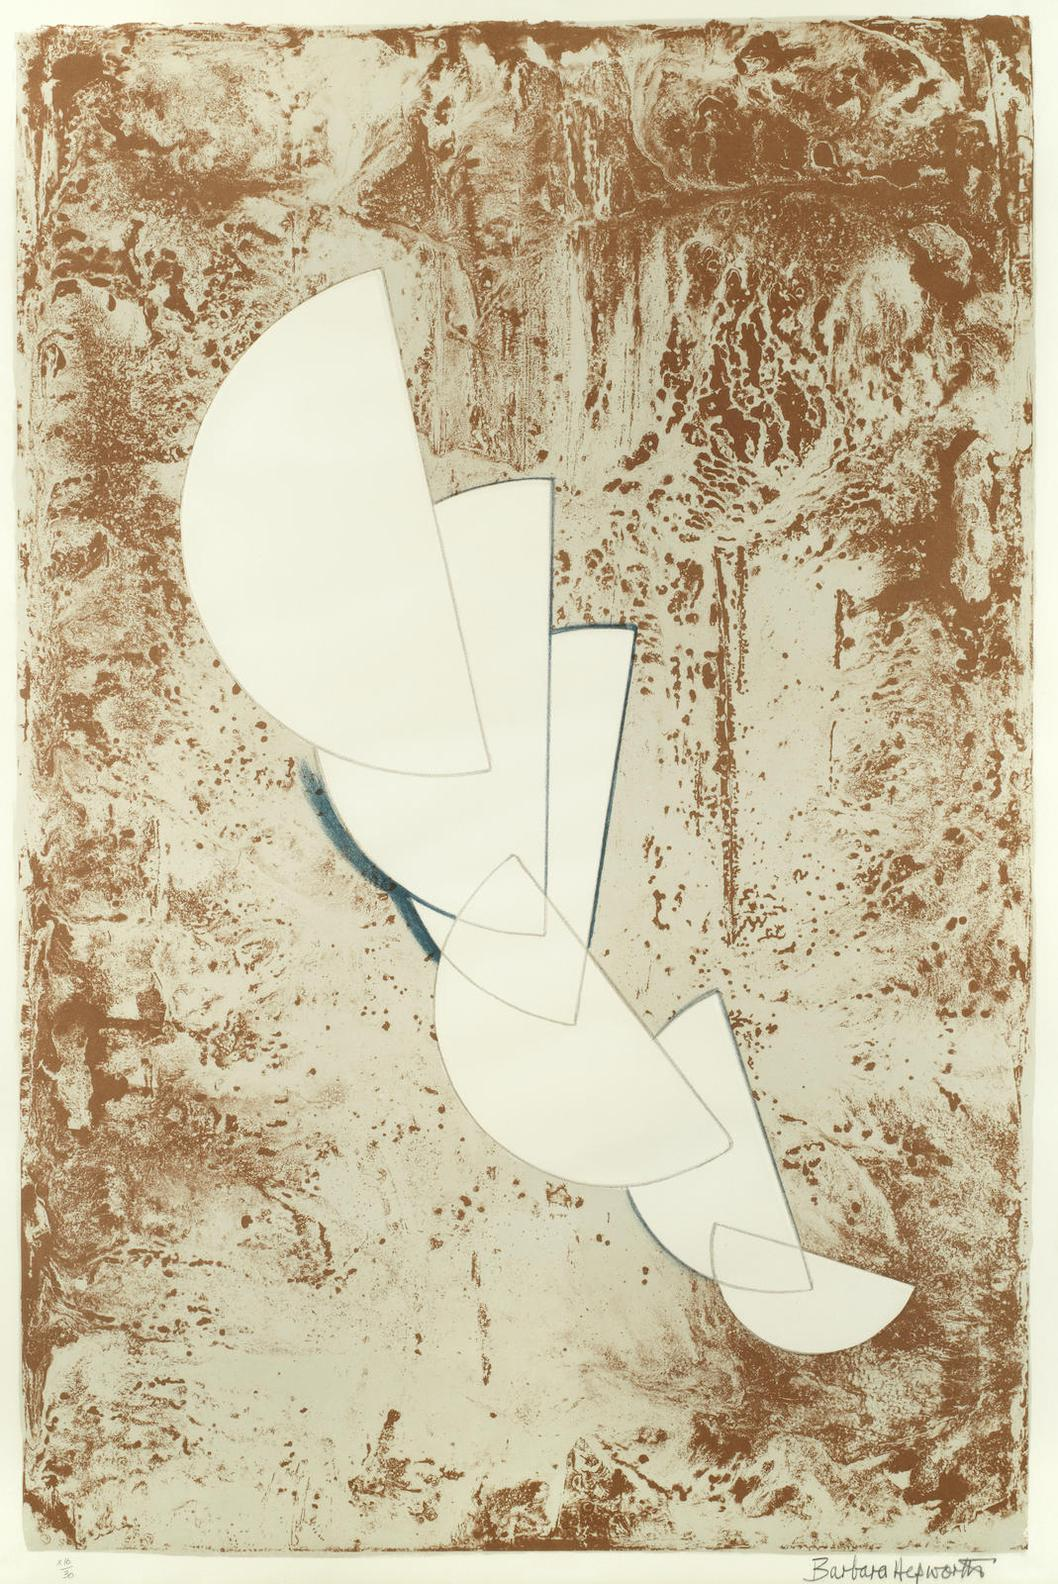 Barbara Hepworth-Fragment, From Aegean Suite-1971